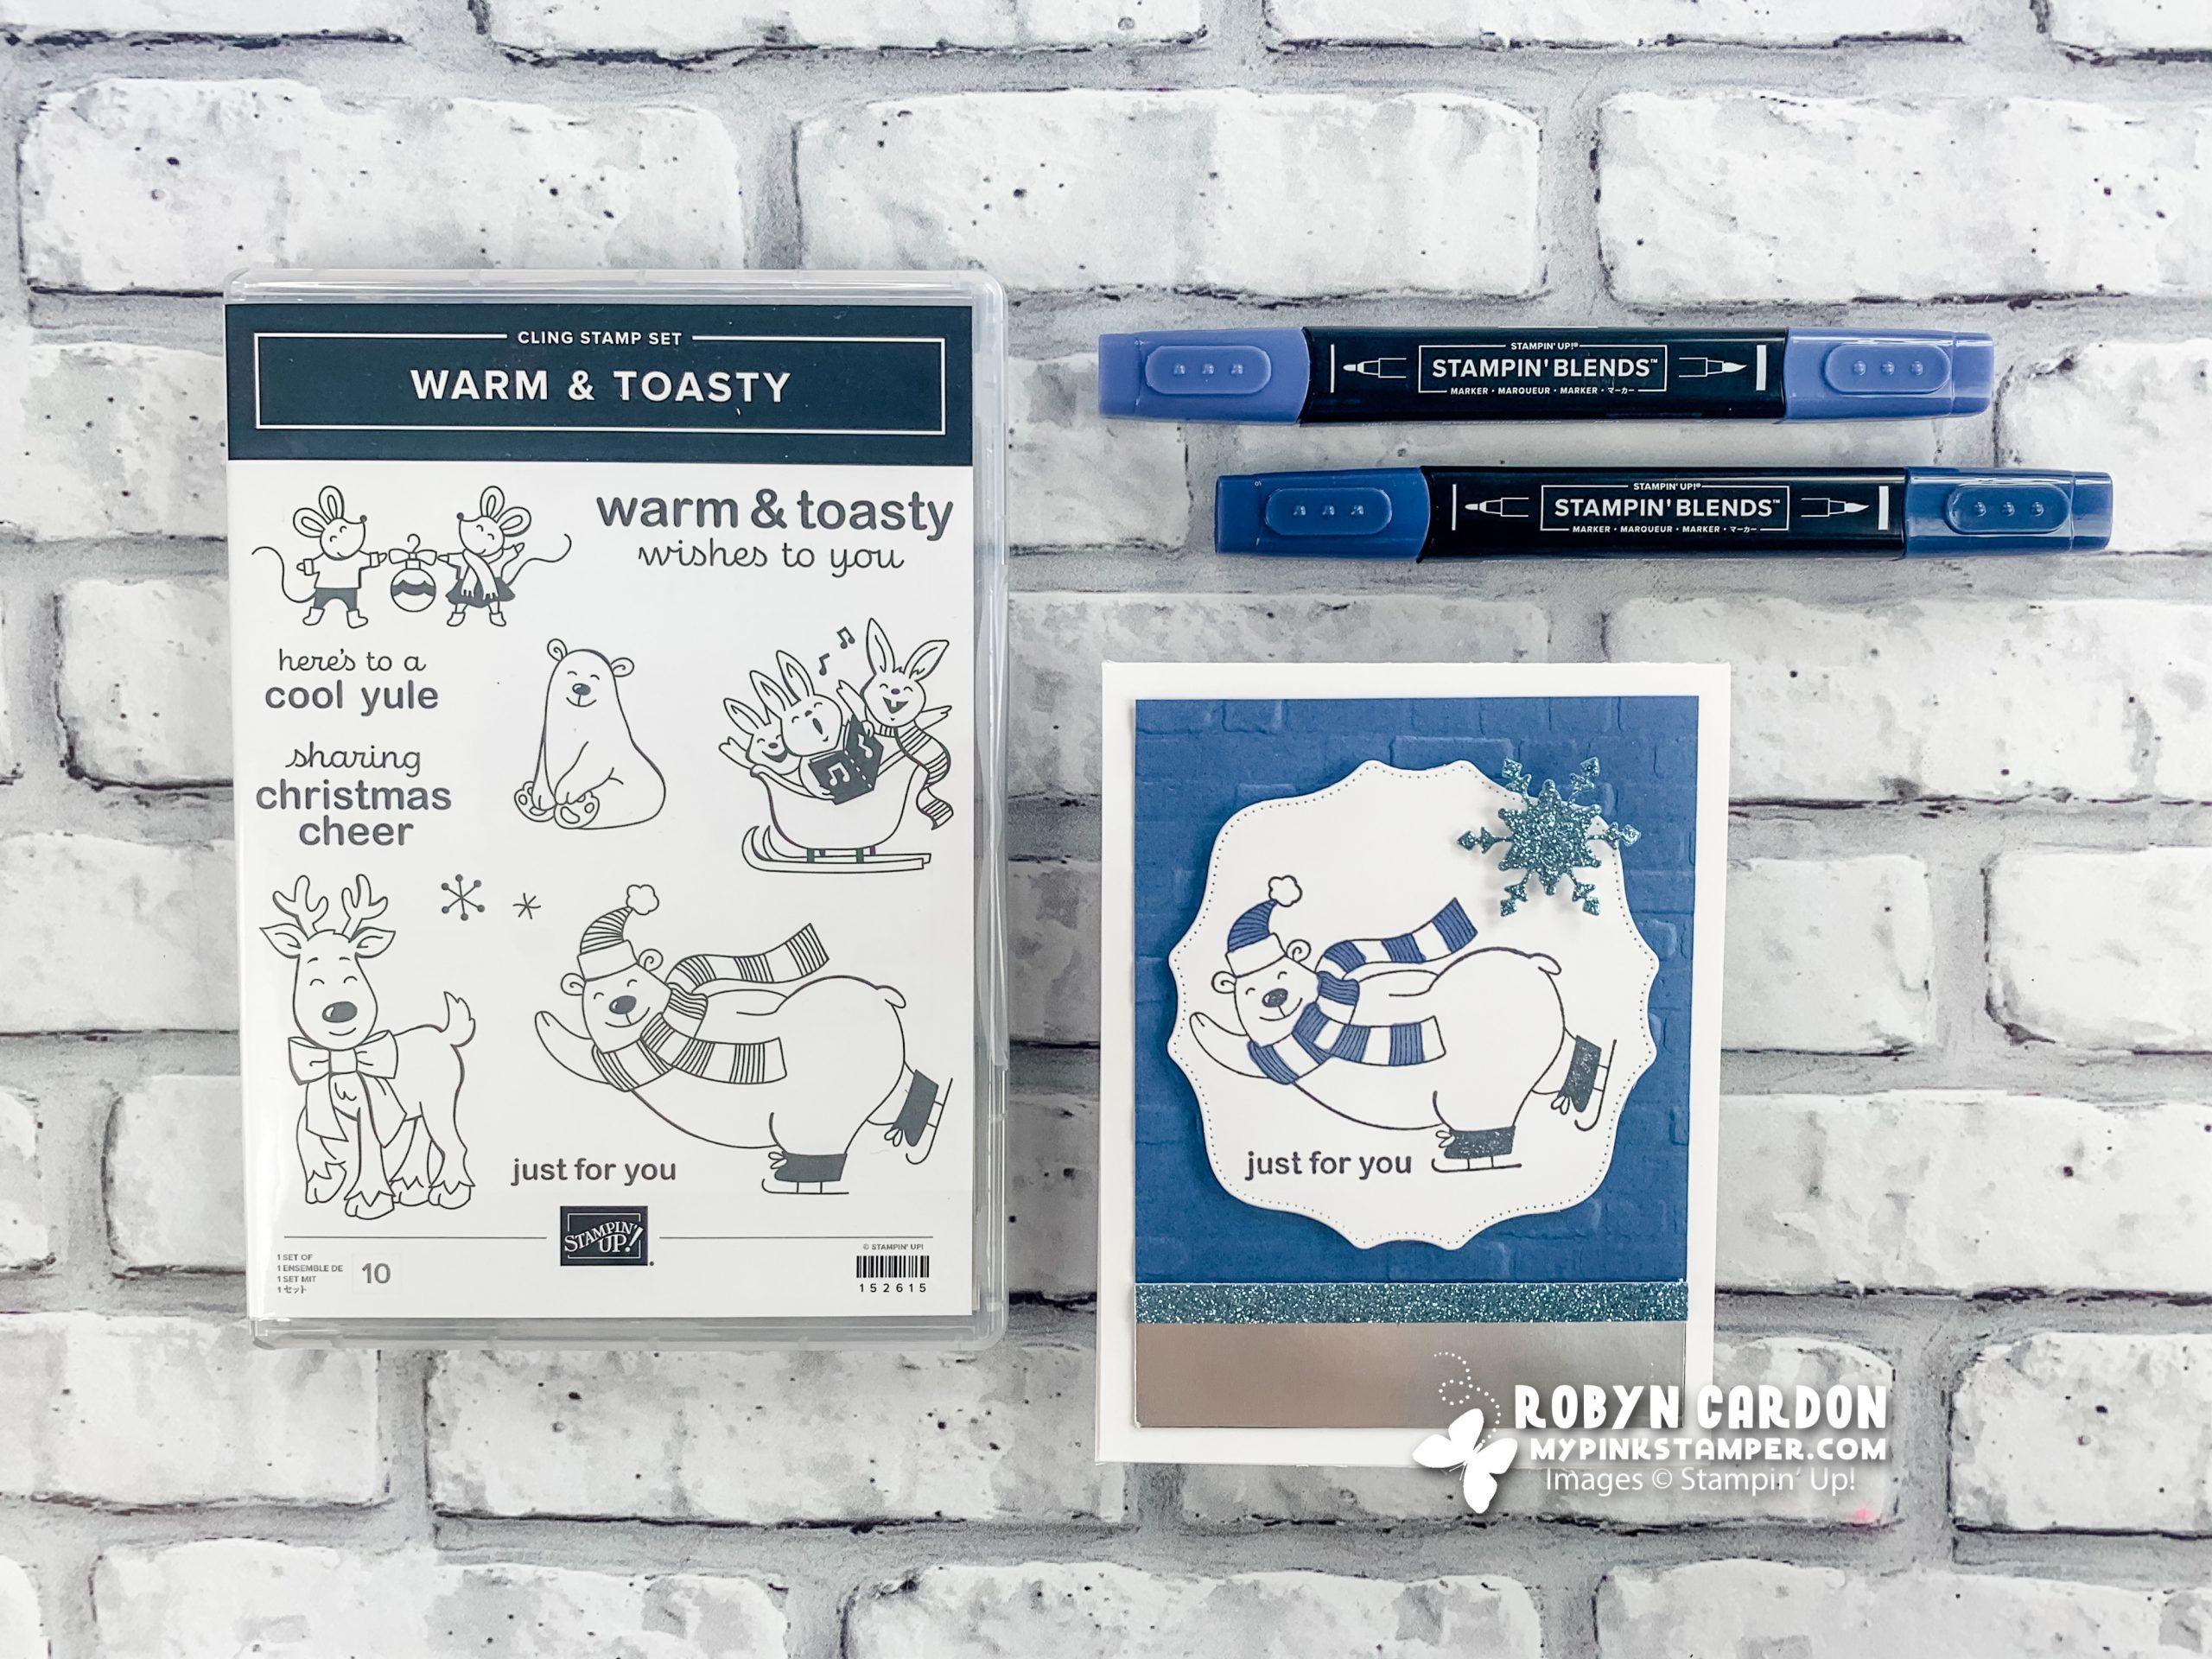 {VIDEO}Episode 798 – Stampin' Up! Warm & Toasty Polar Bear Card